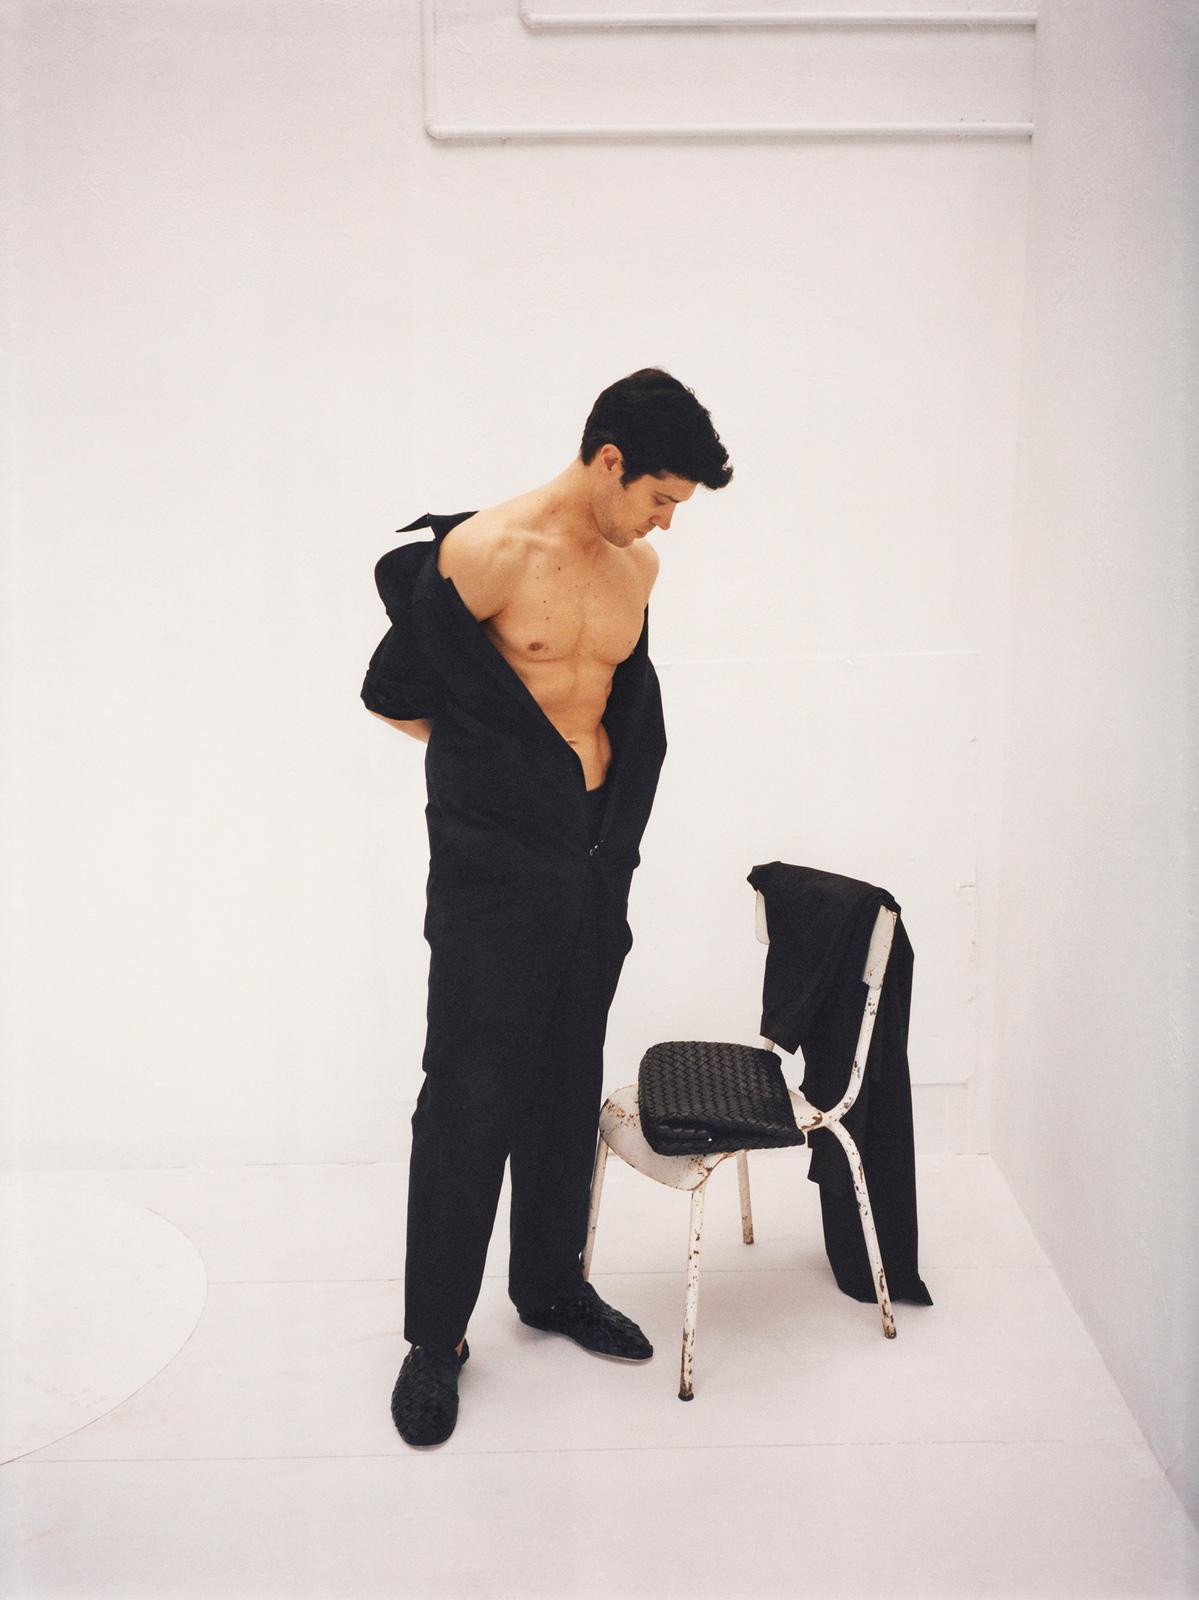 Bottega Veneta's new short film celebrates a diverse, expansive reinvention of masculinity